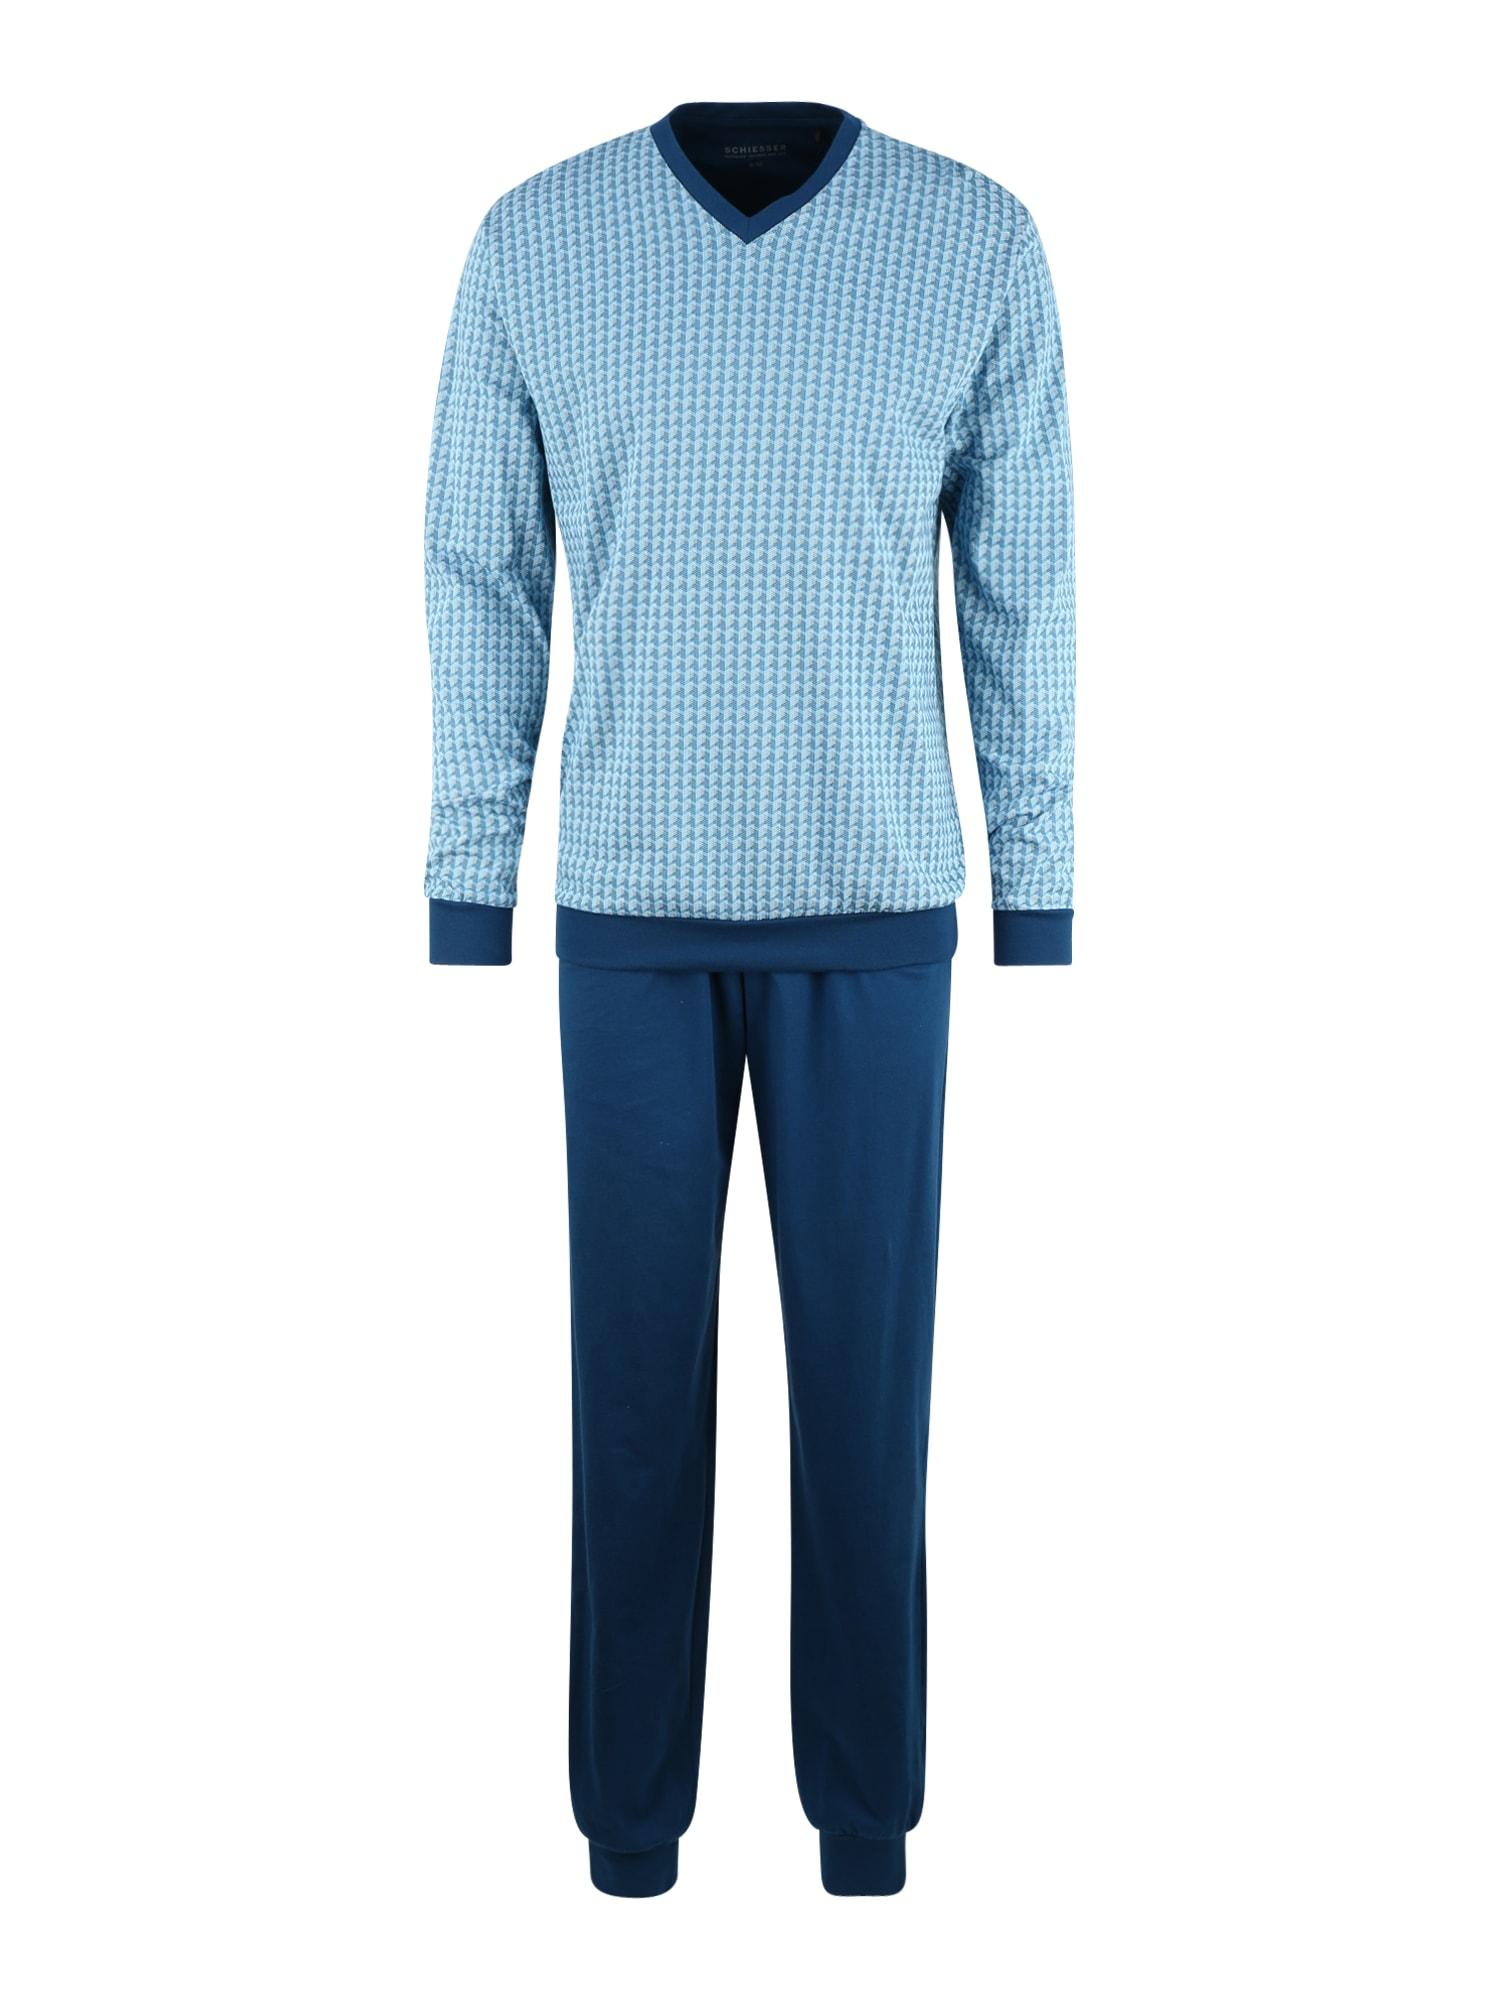 SCHIESSER Ilga pižama šviesiai mėlyna / tamsiai mėlyna